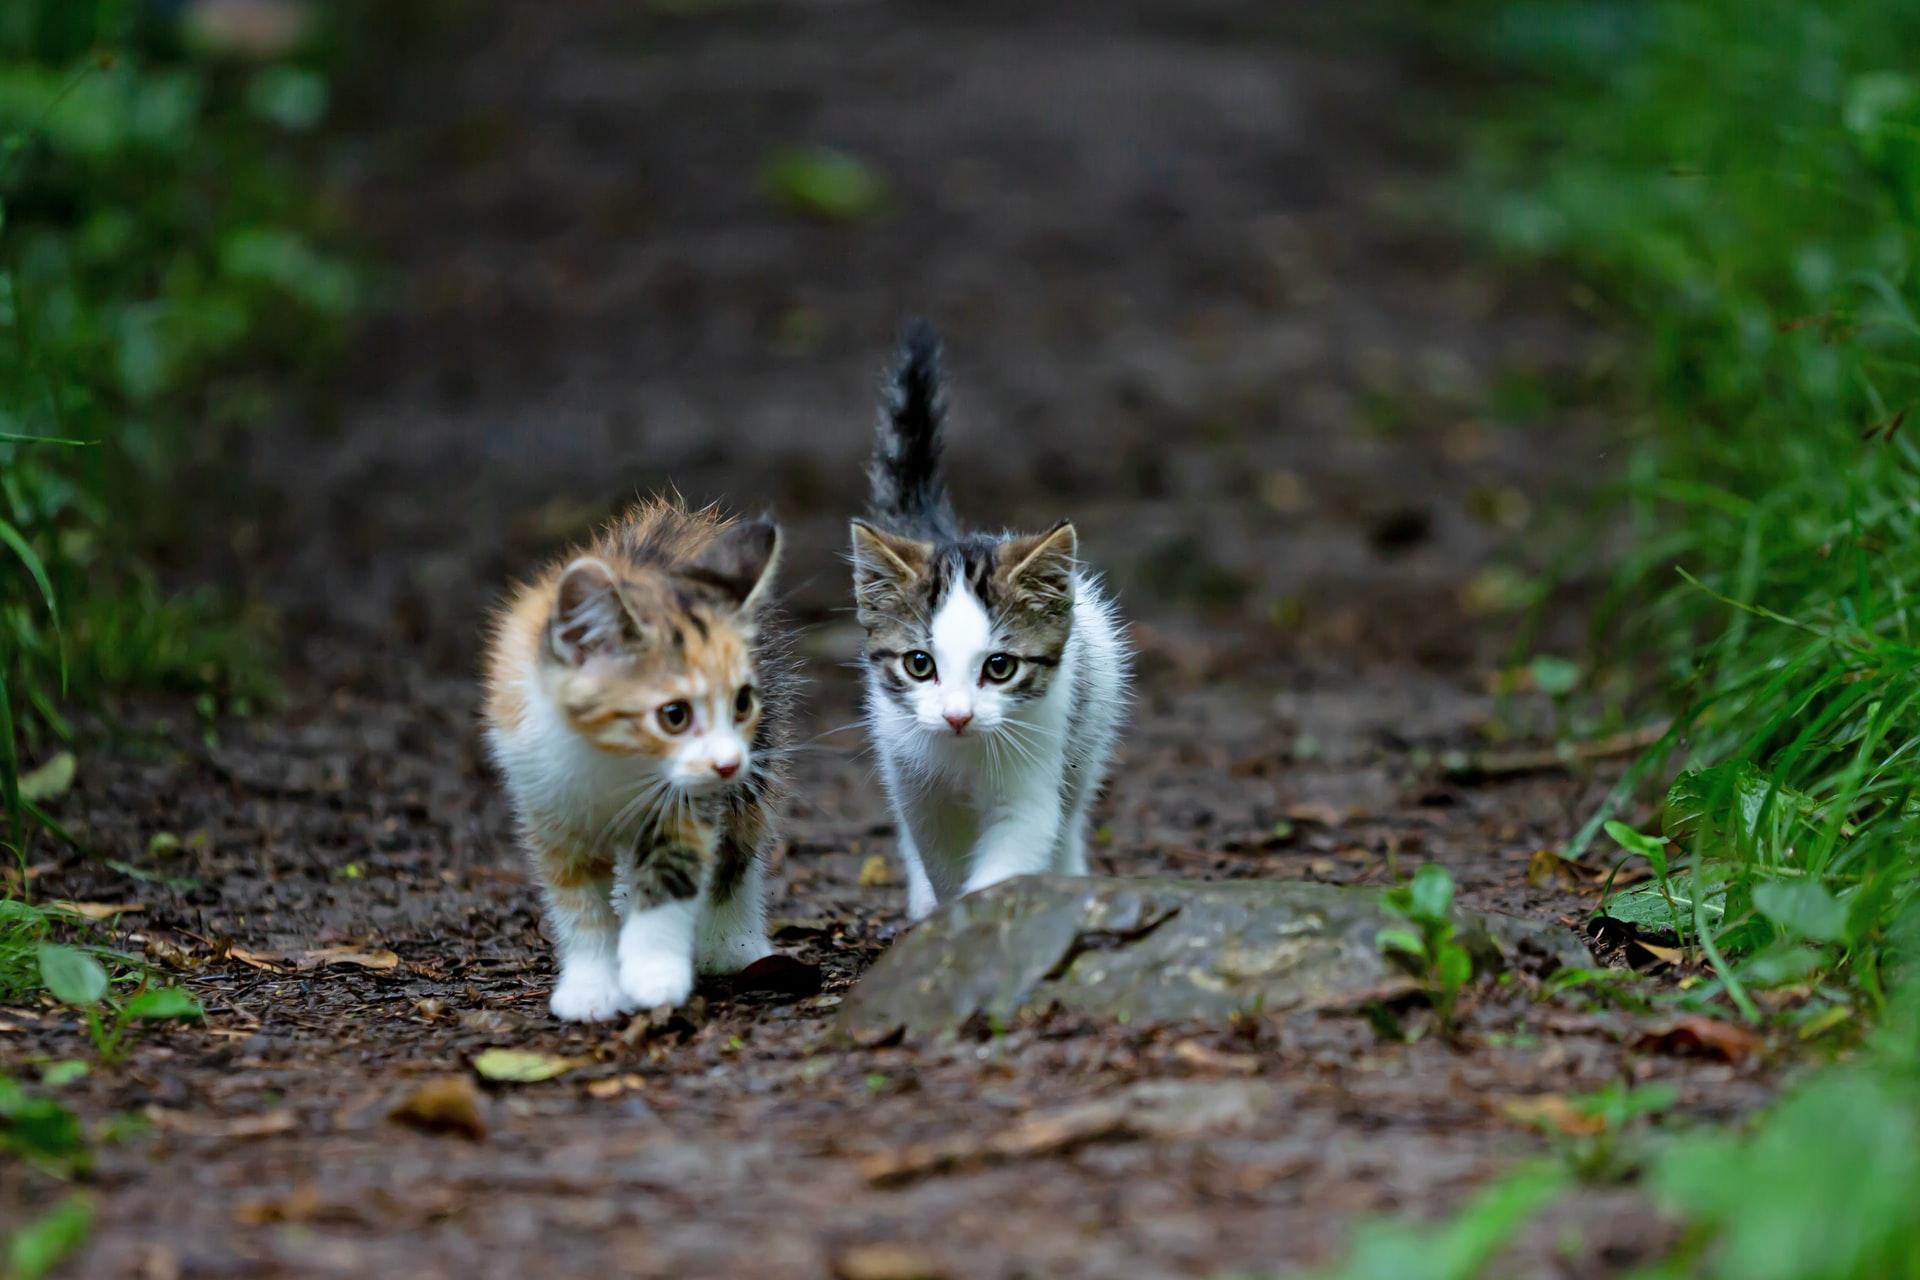 two kittens walking side by side on dirt path